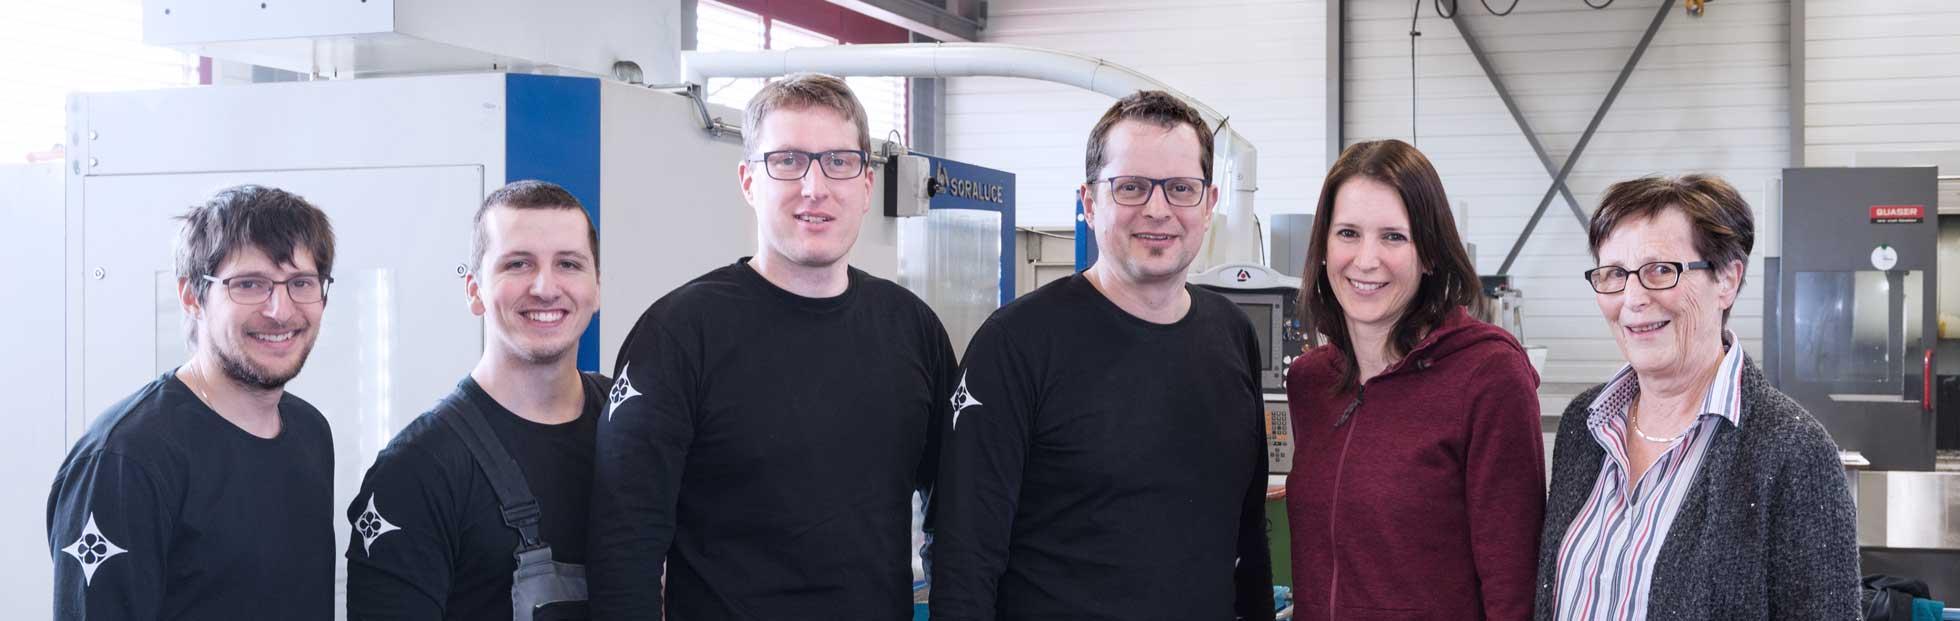 CNC-Fertigung Team Hutterli AG